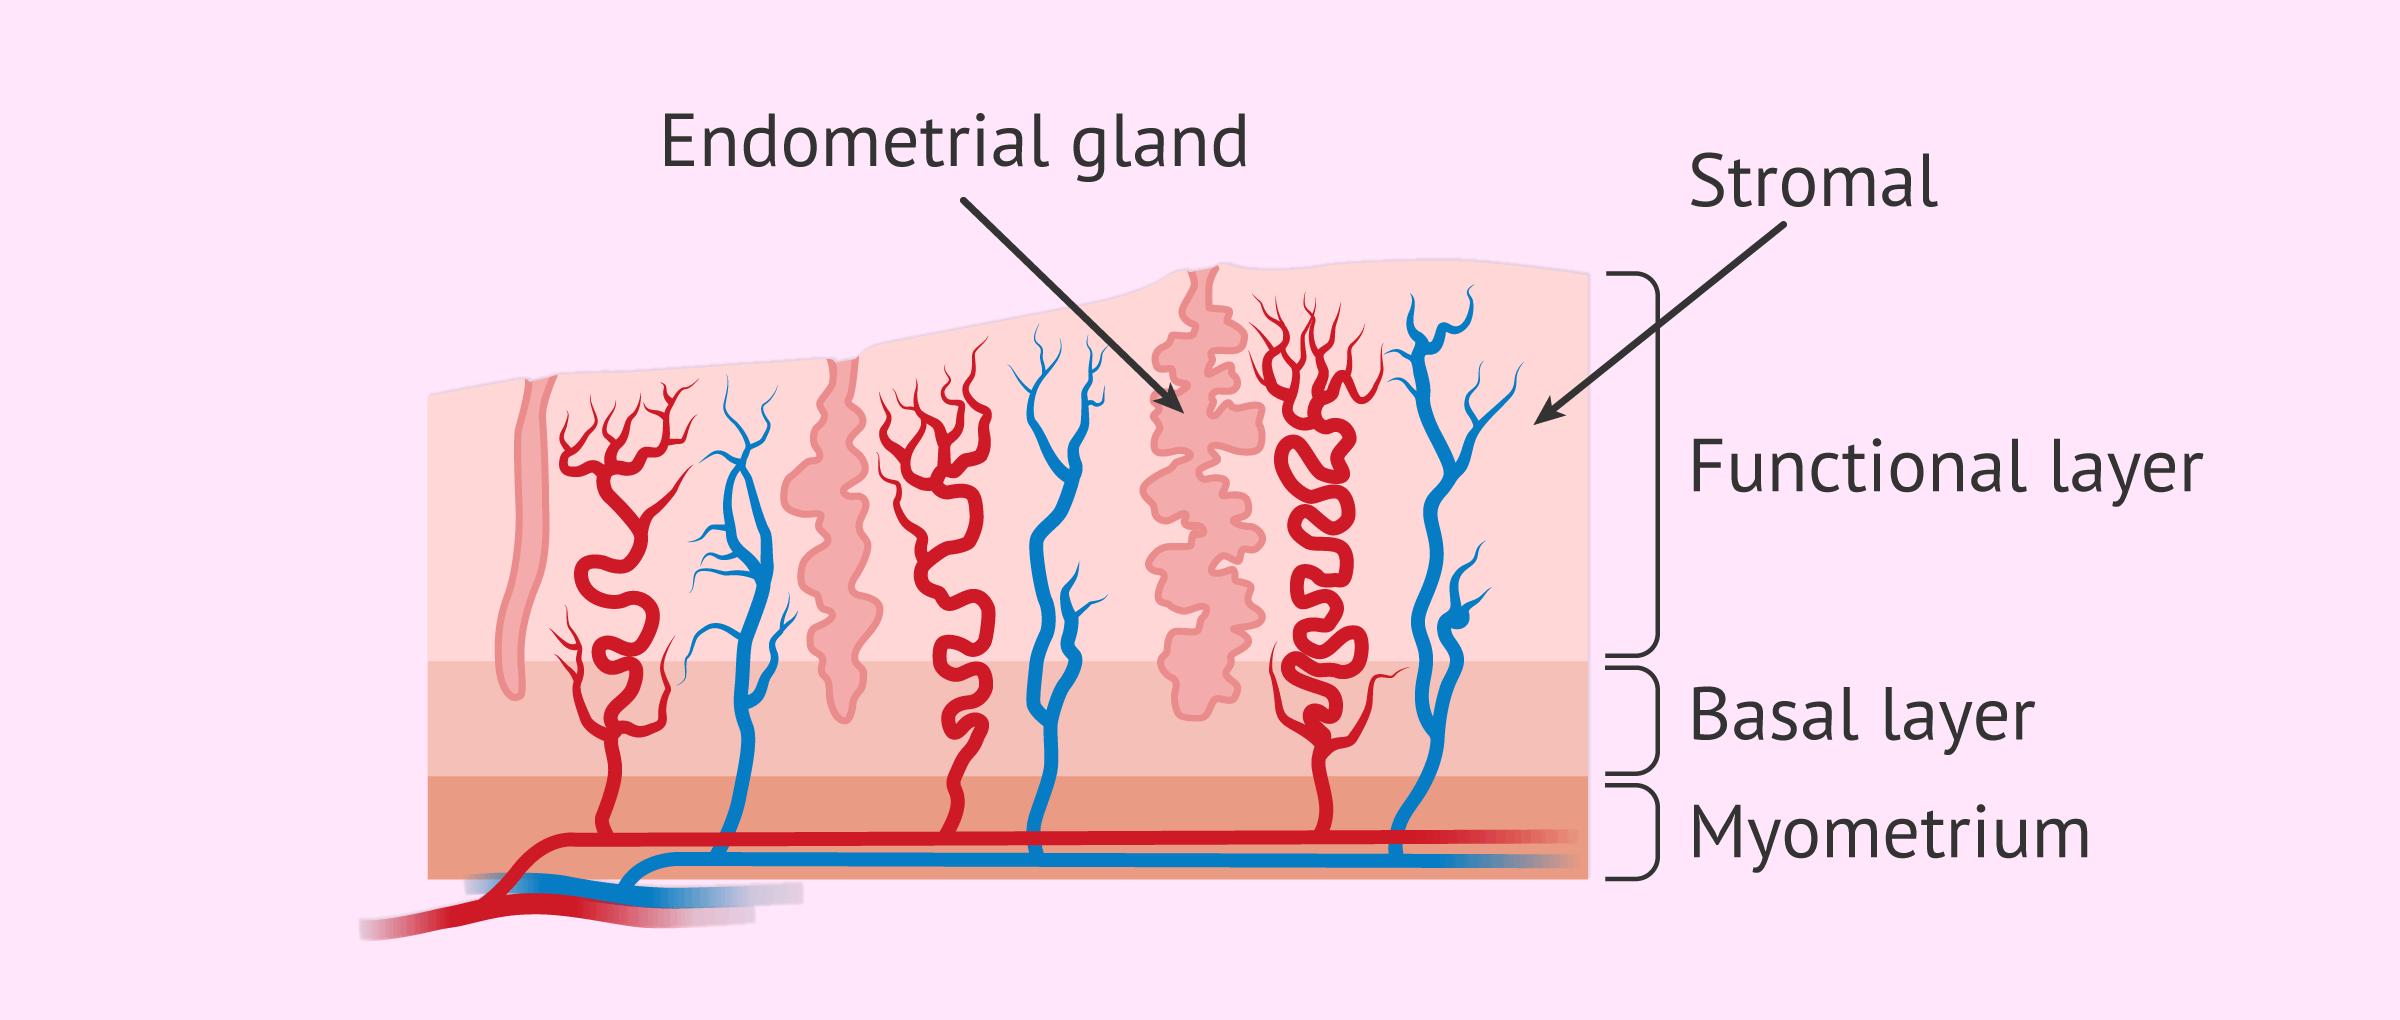 Endometrial changes